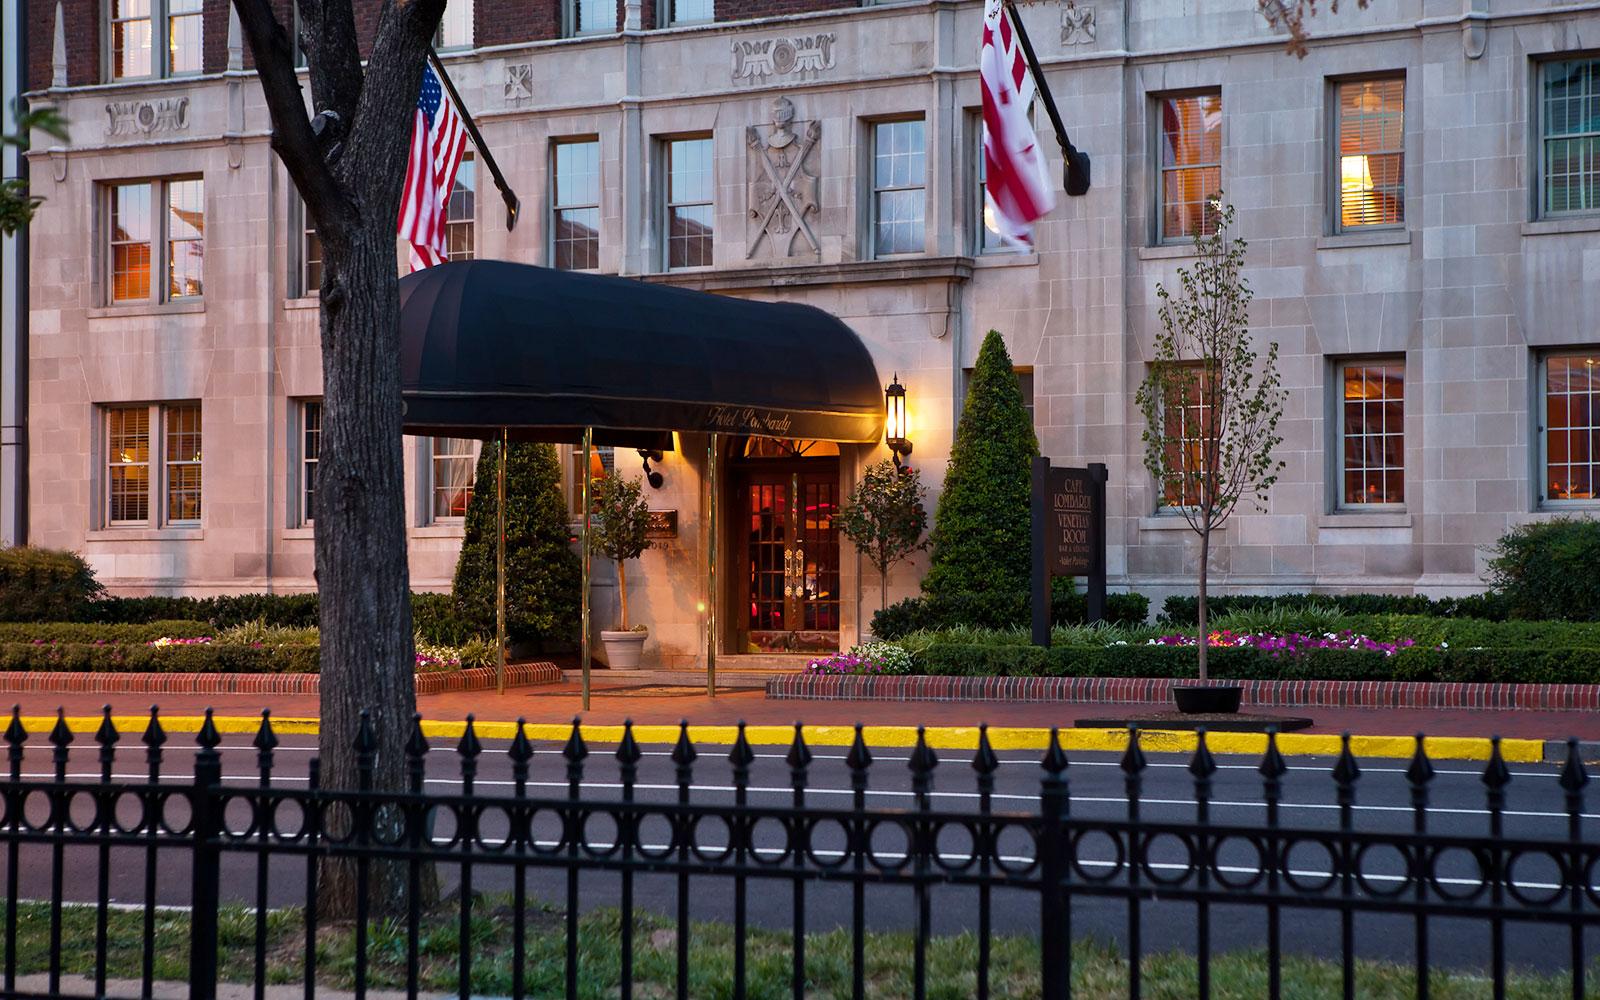 Hotel Lombardy, Washington D.C. Wetbar